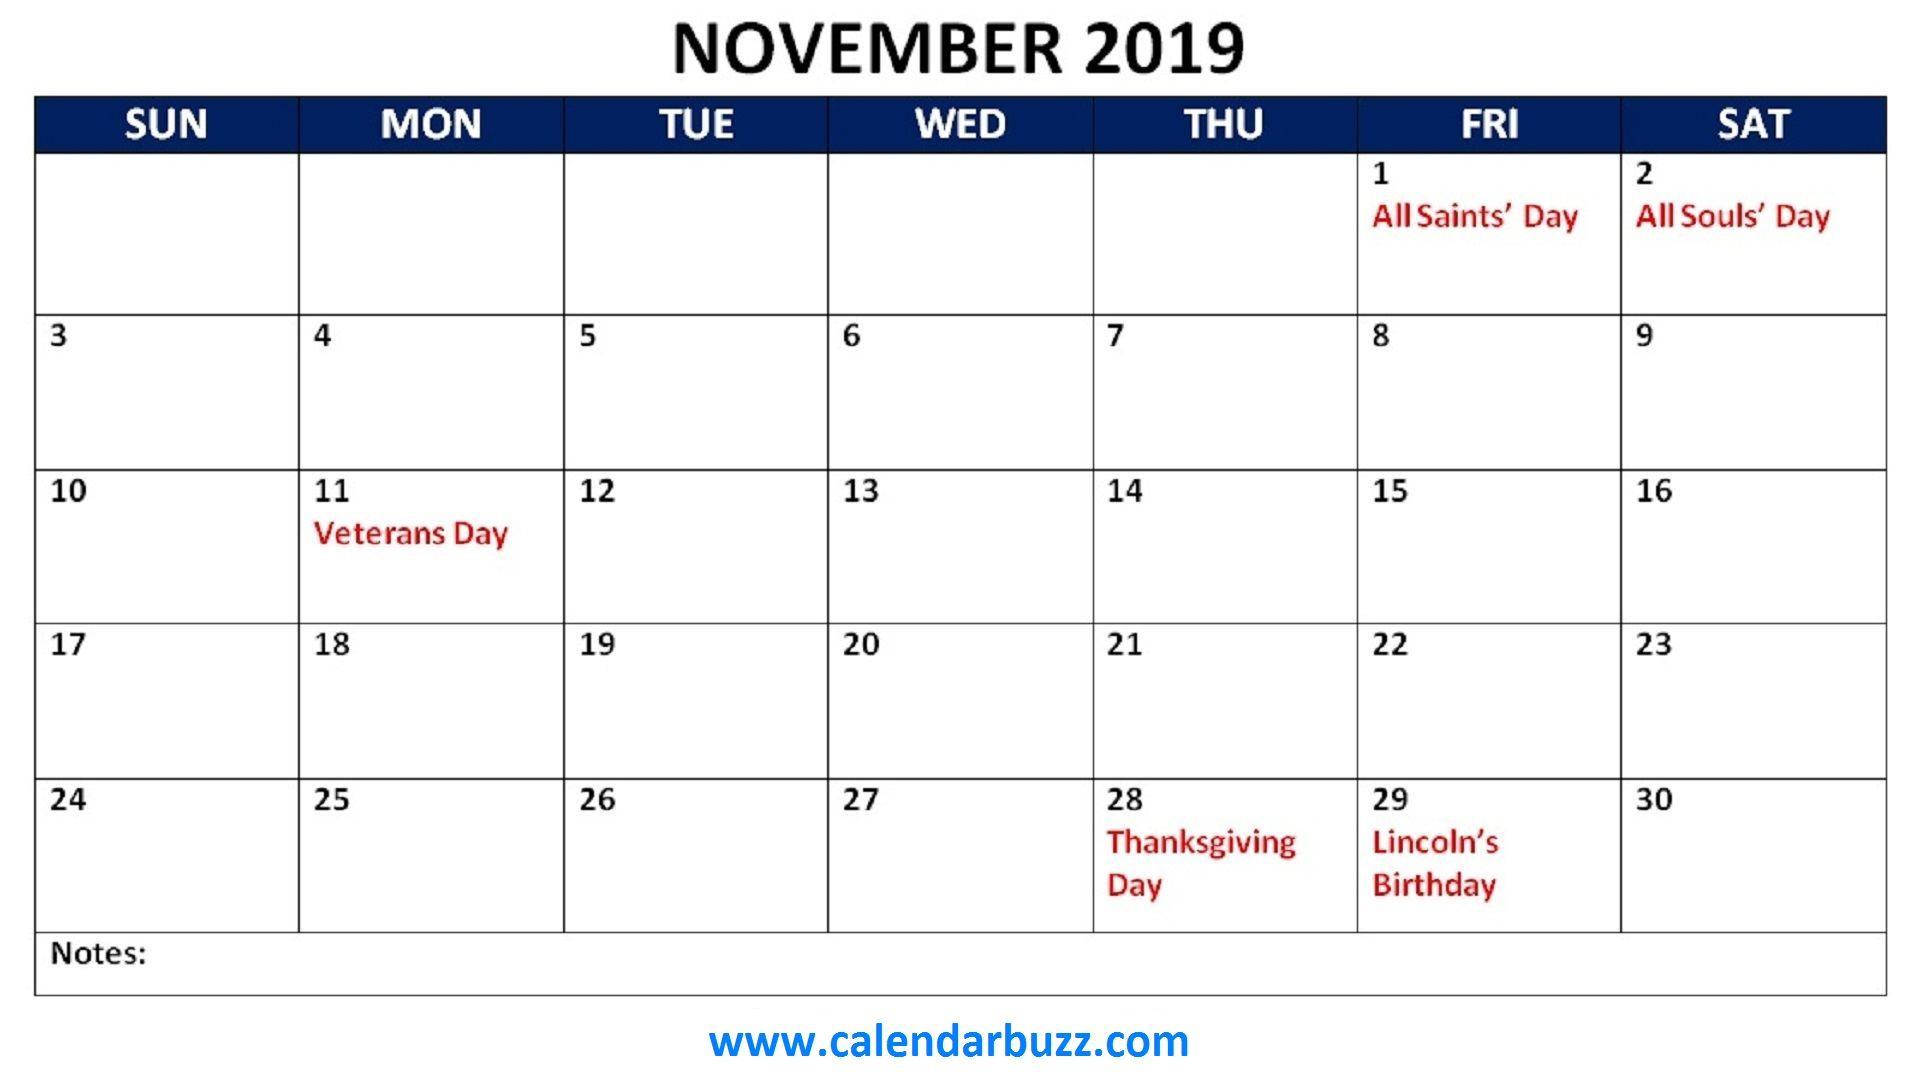 Printable Calendar November And December 2019 With Holidays november 2019 holidays calendar printable | 2019 Calendars